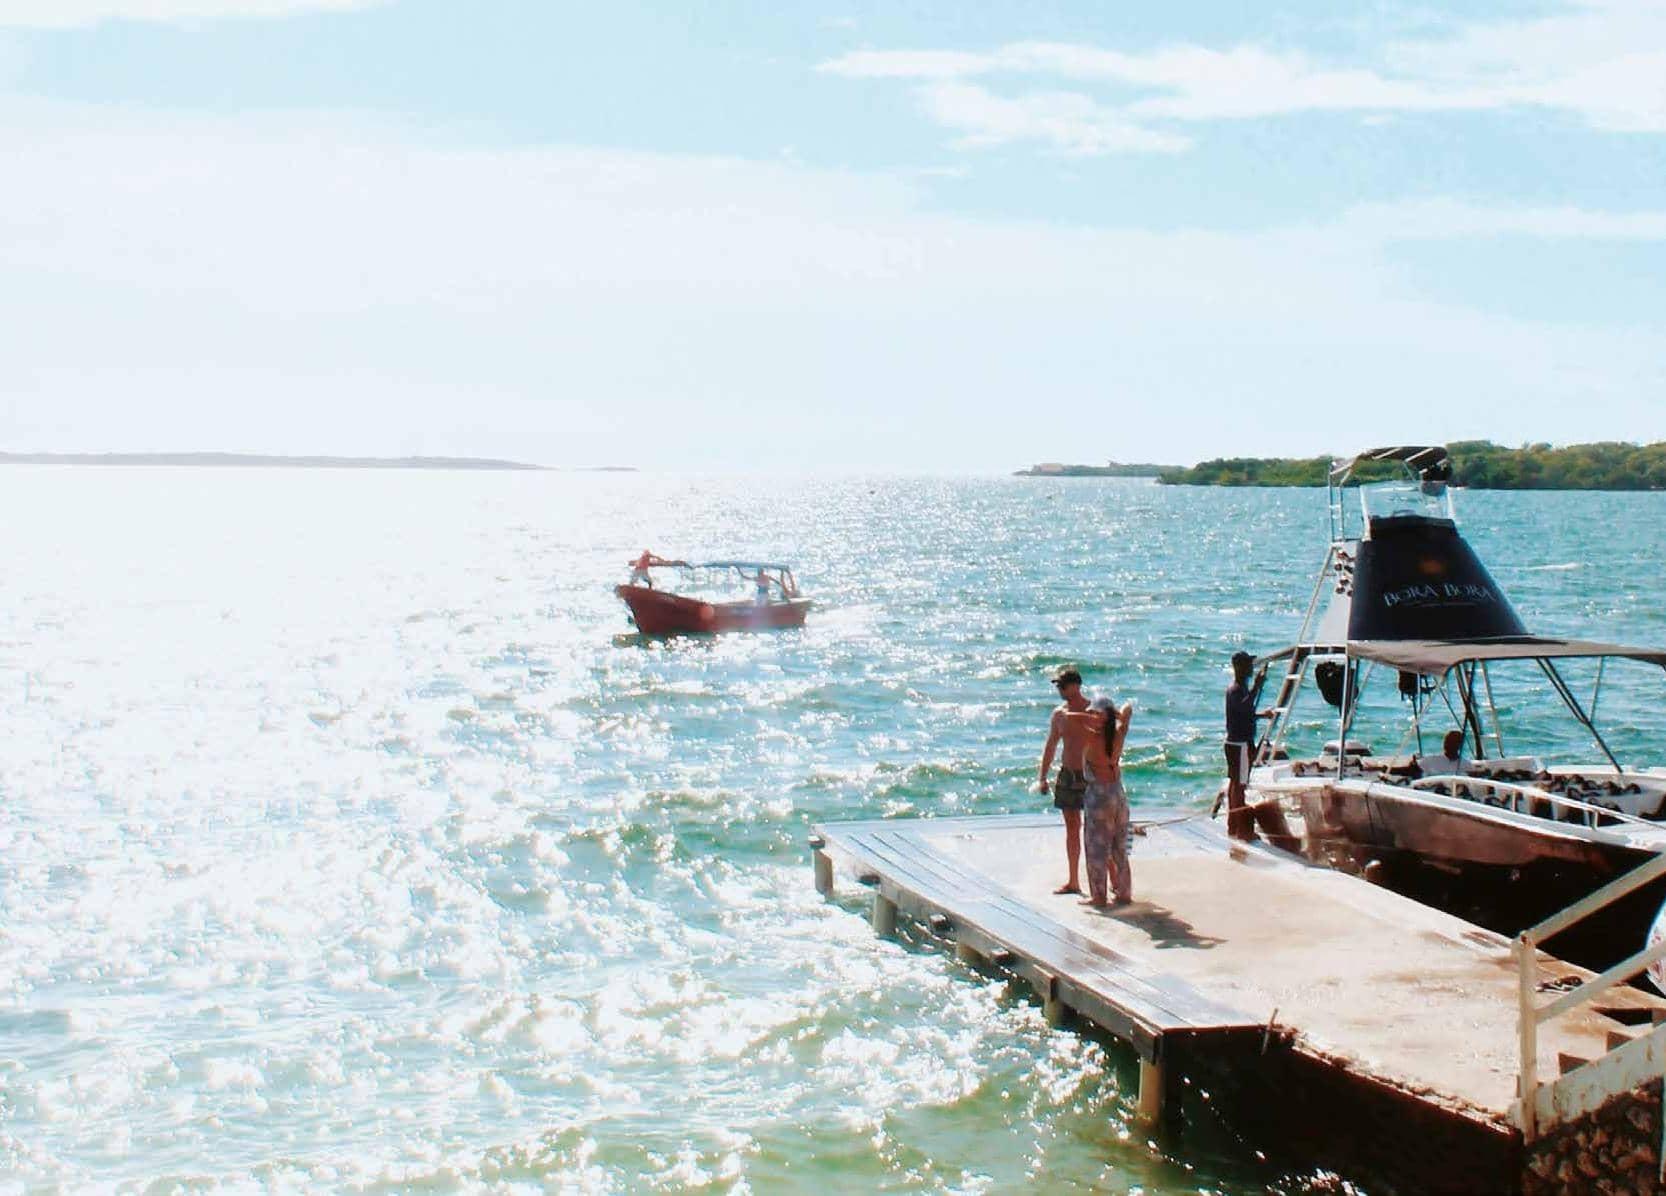 The Euphoric Island Getaway